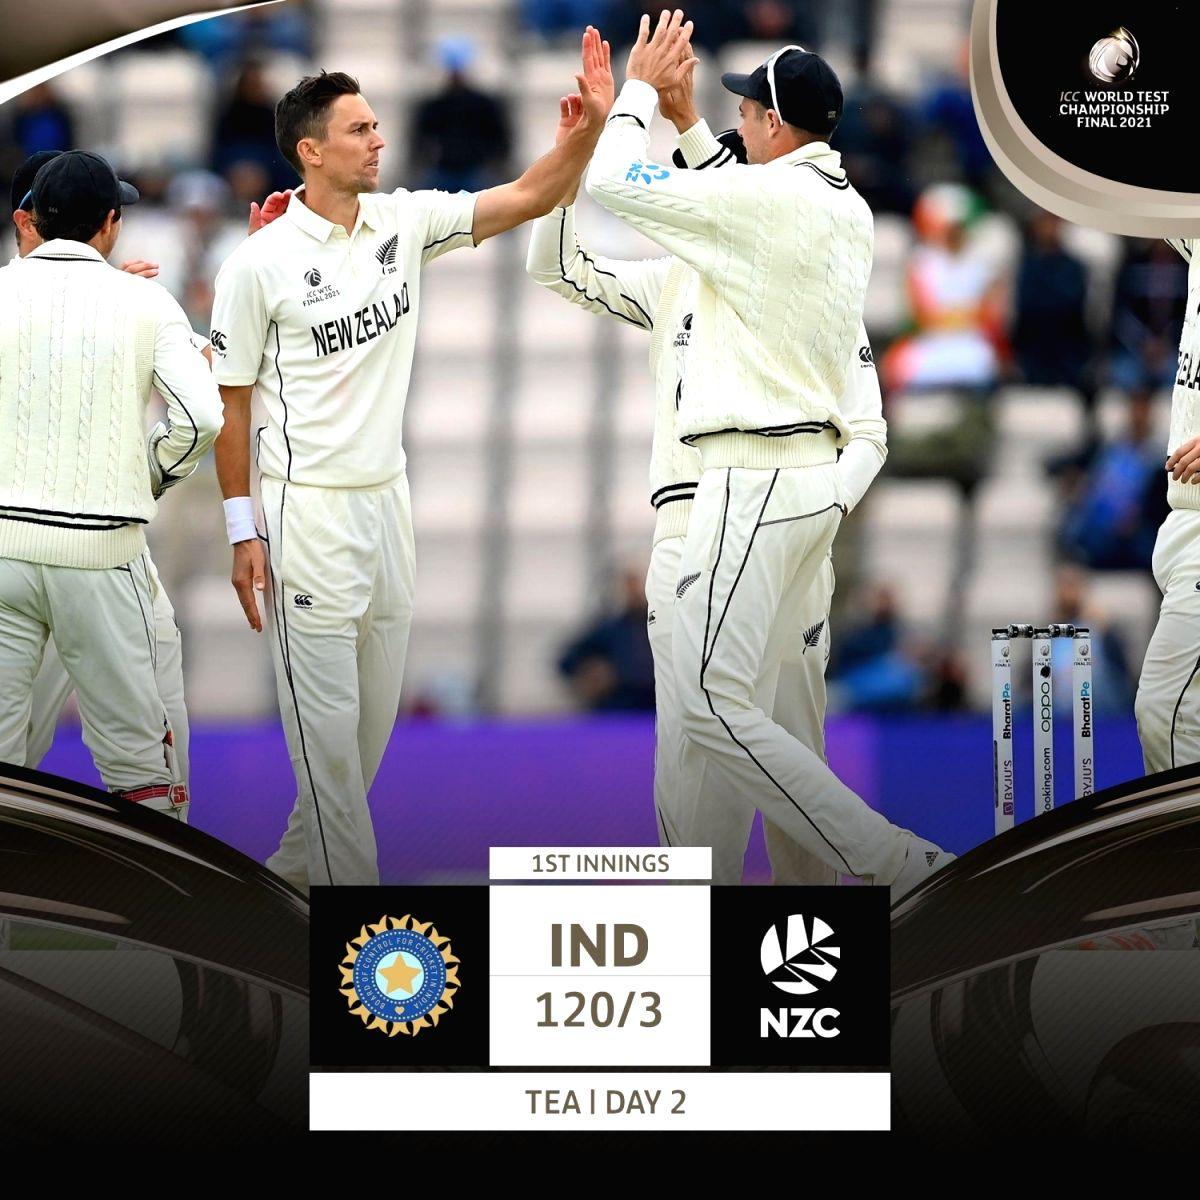 India vs New Zealand WTC Final .(photo:ICC Twitter)